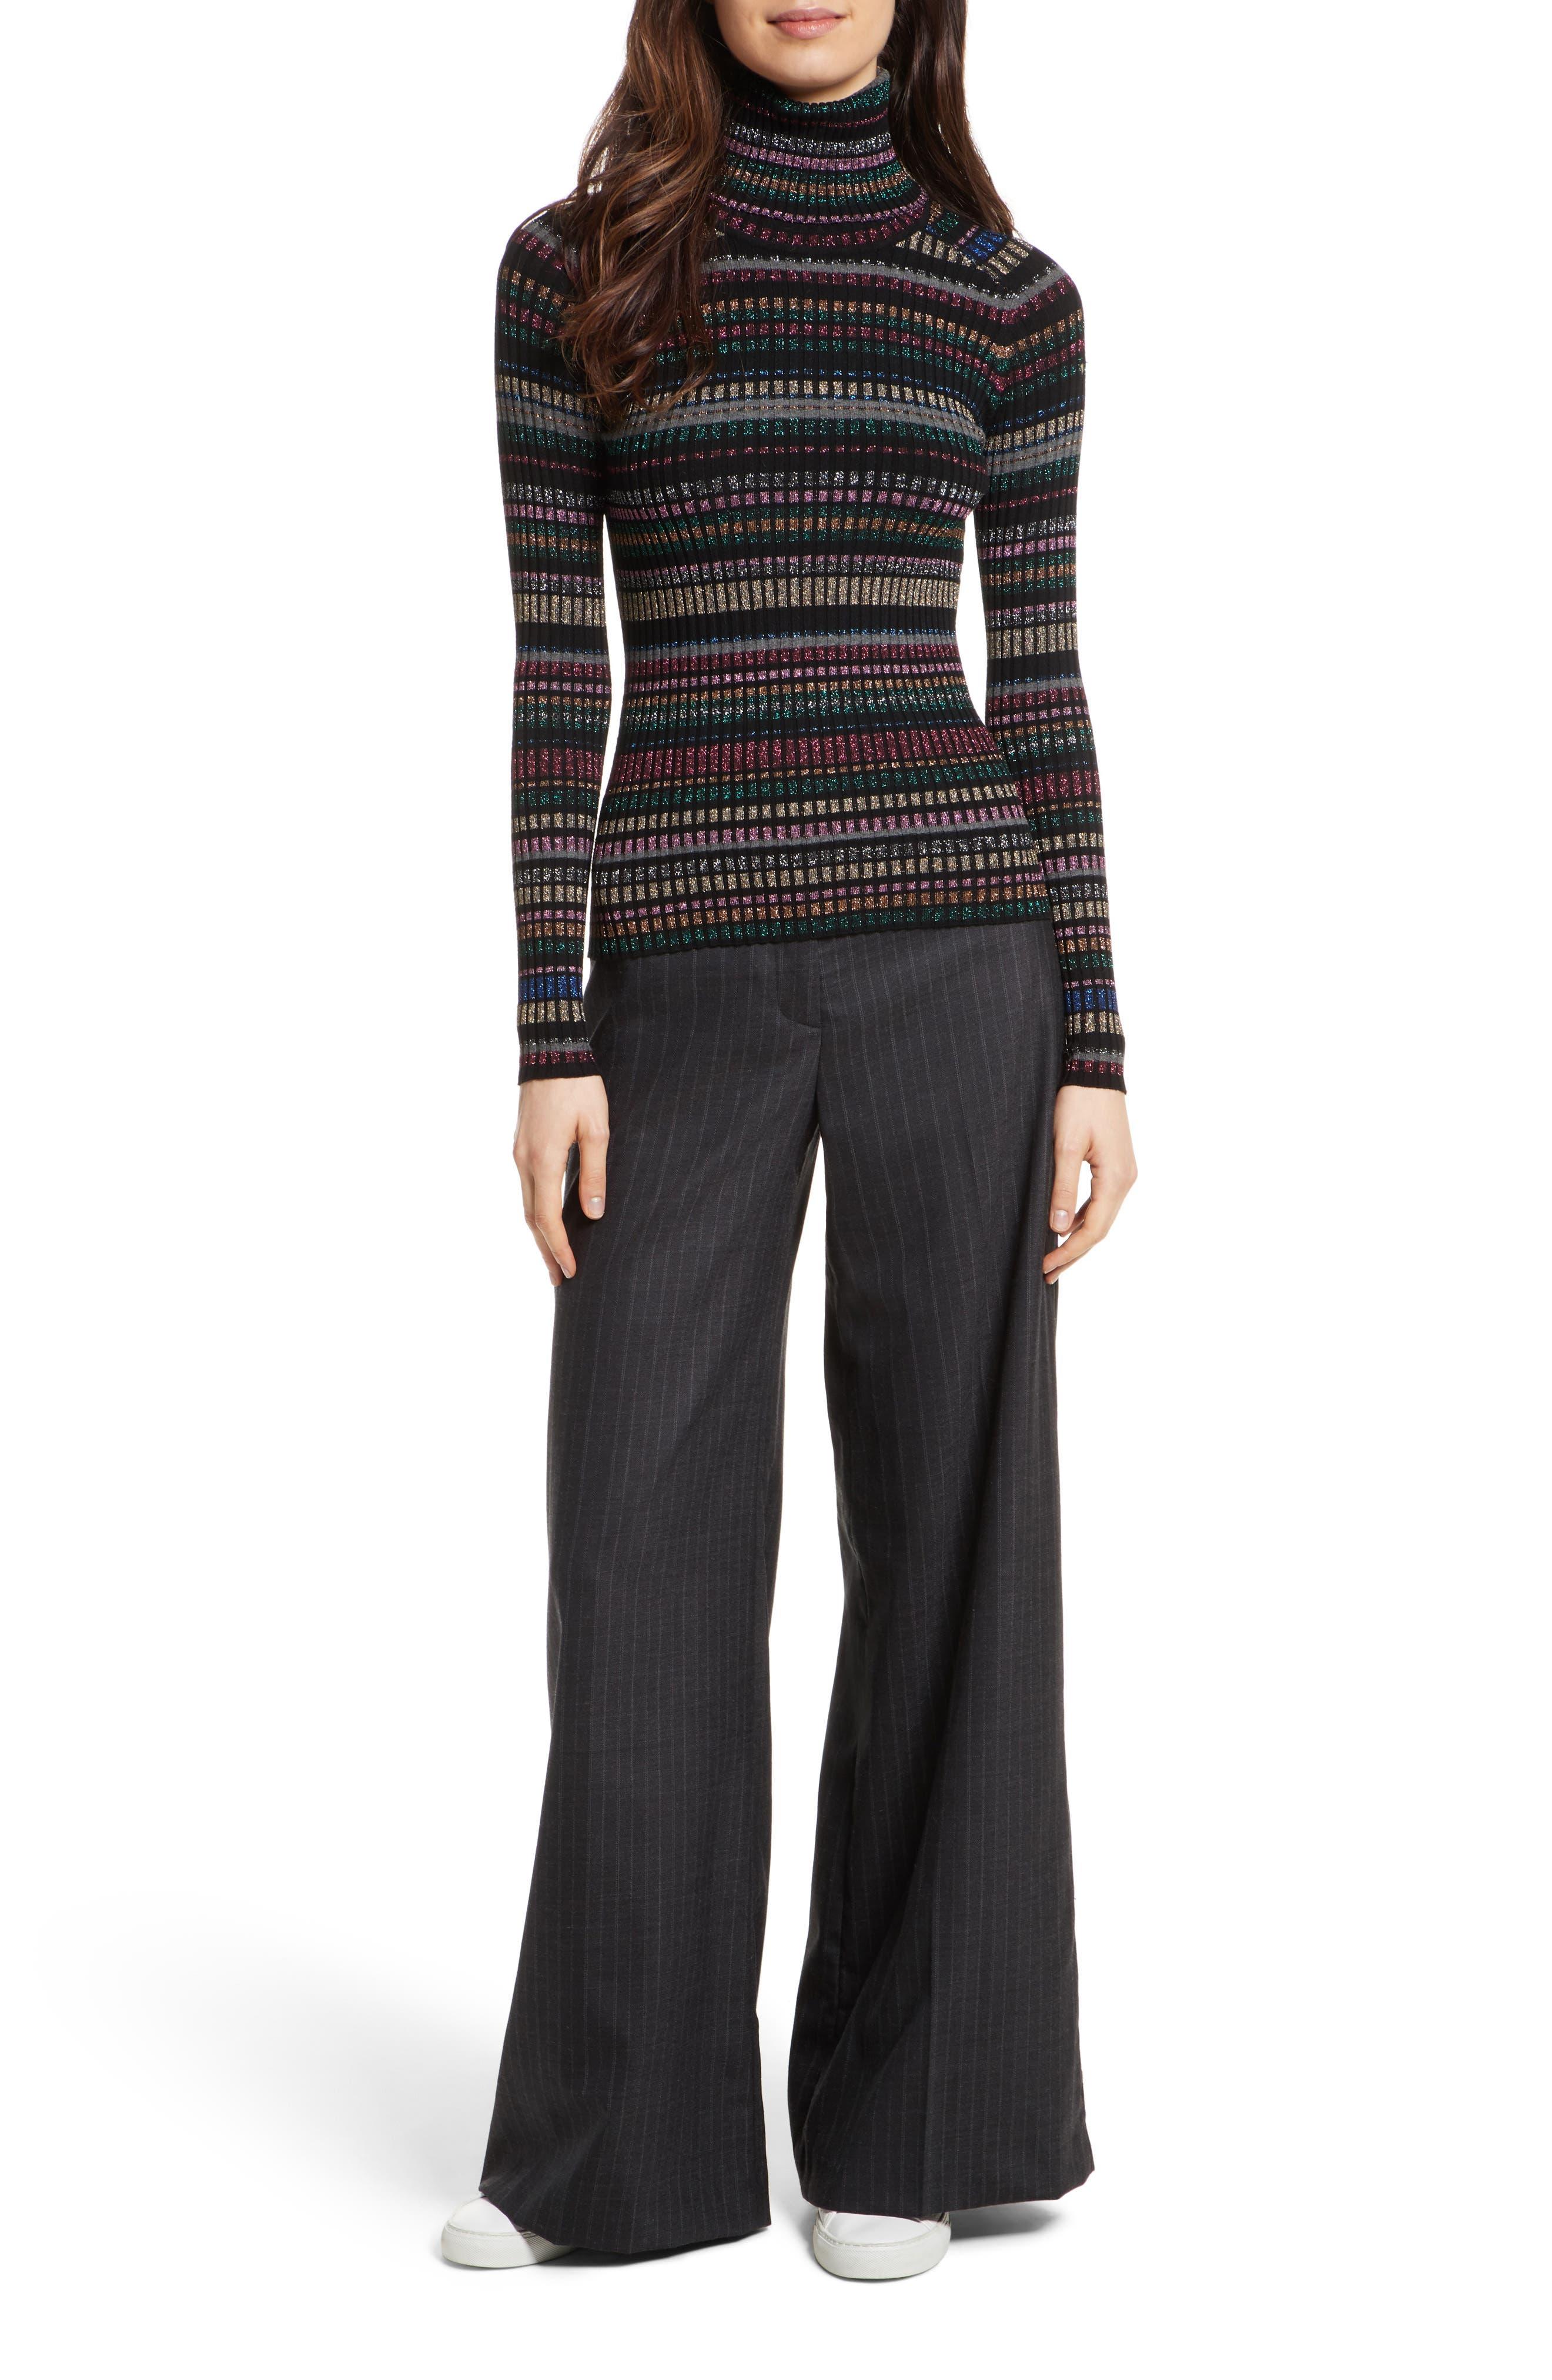 Sia Pinstripe Italian Stretch Wool Trousers,                             Alternate thumbnail 2, color,                             Grey Stripe